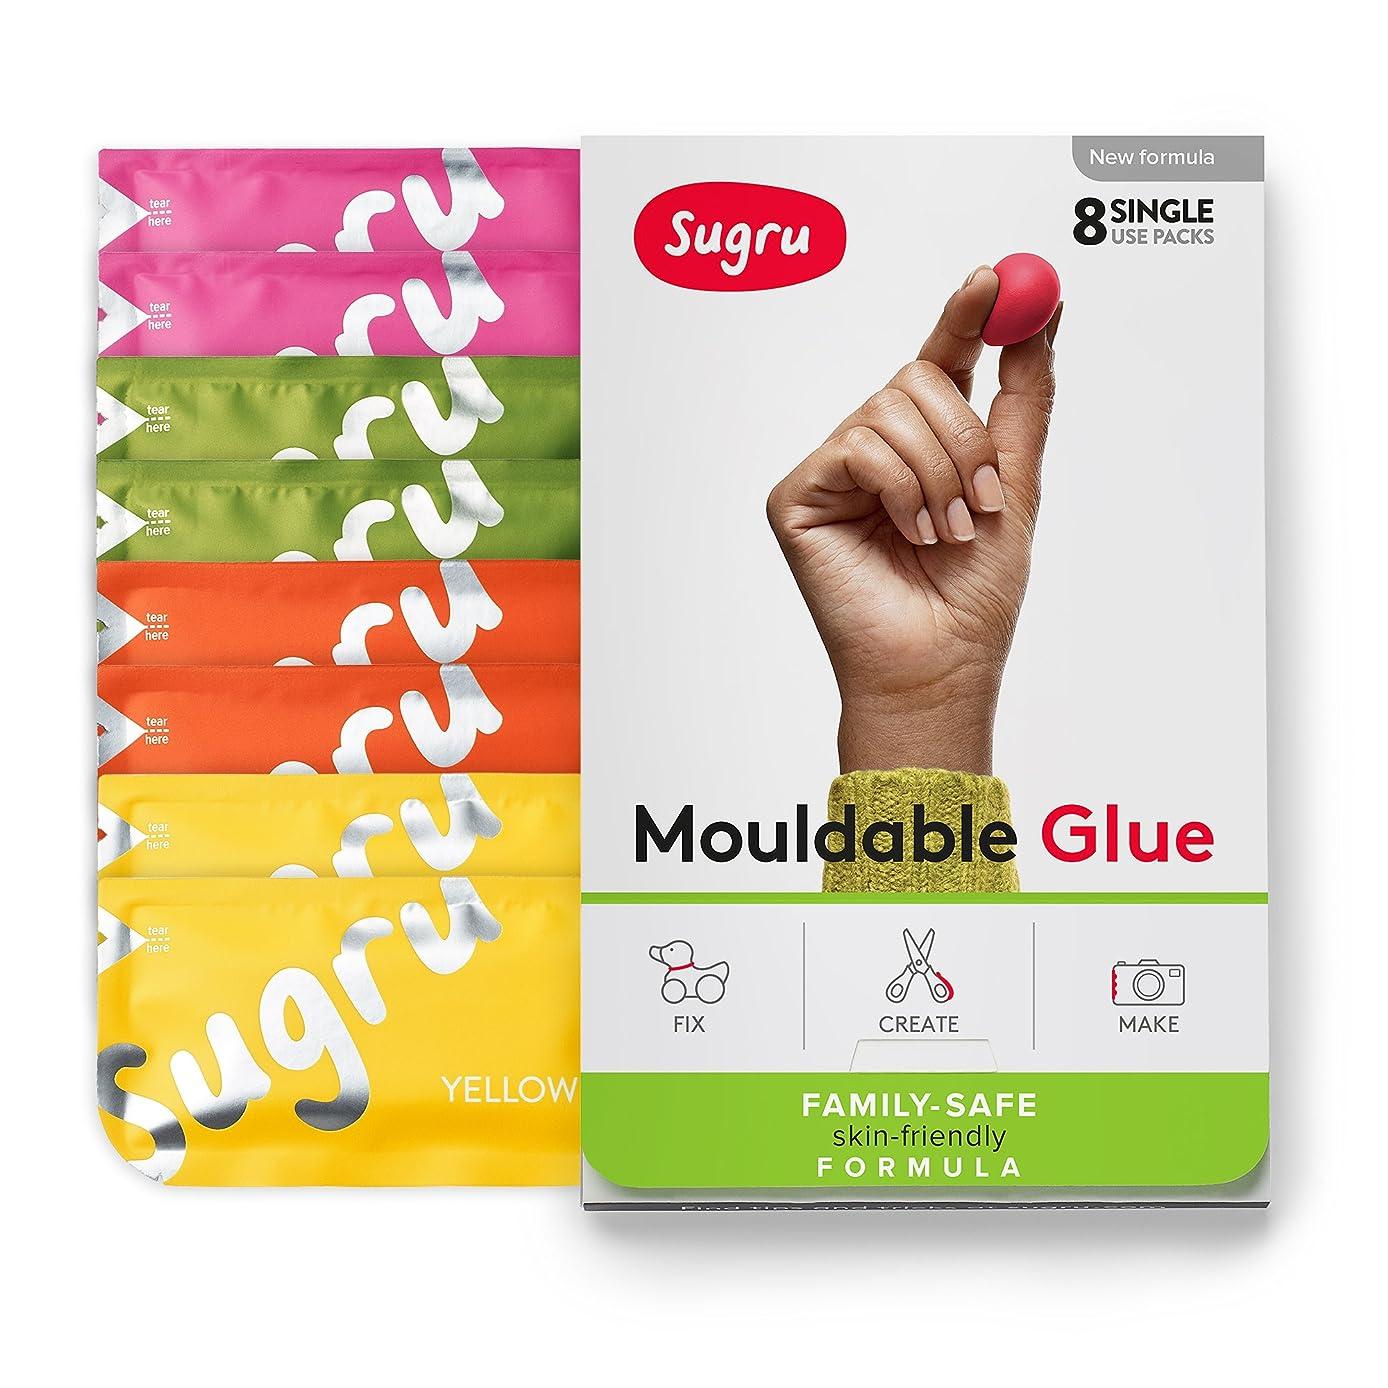 Sugru Moldable Glue - Family-safe | Skin-friendly Formula - Playful Colors 8-Pack